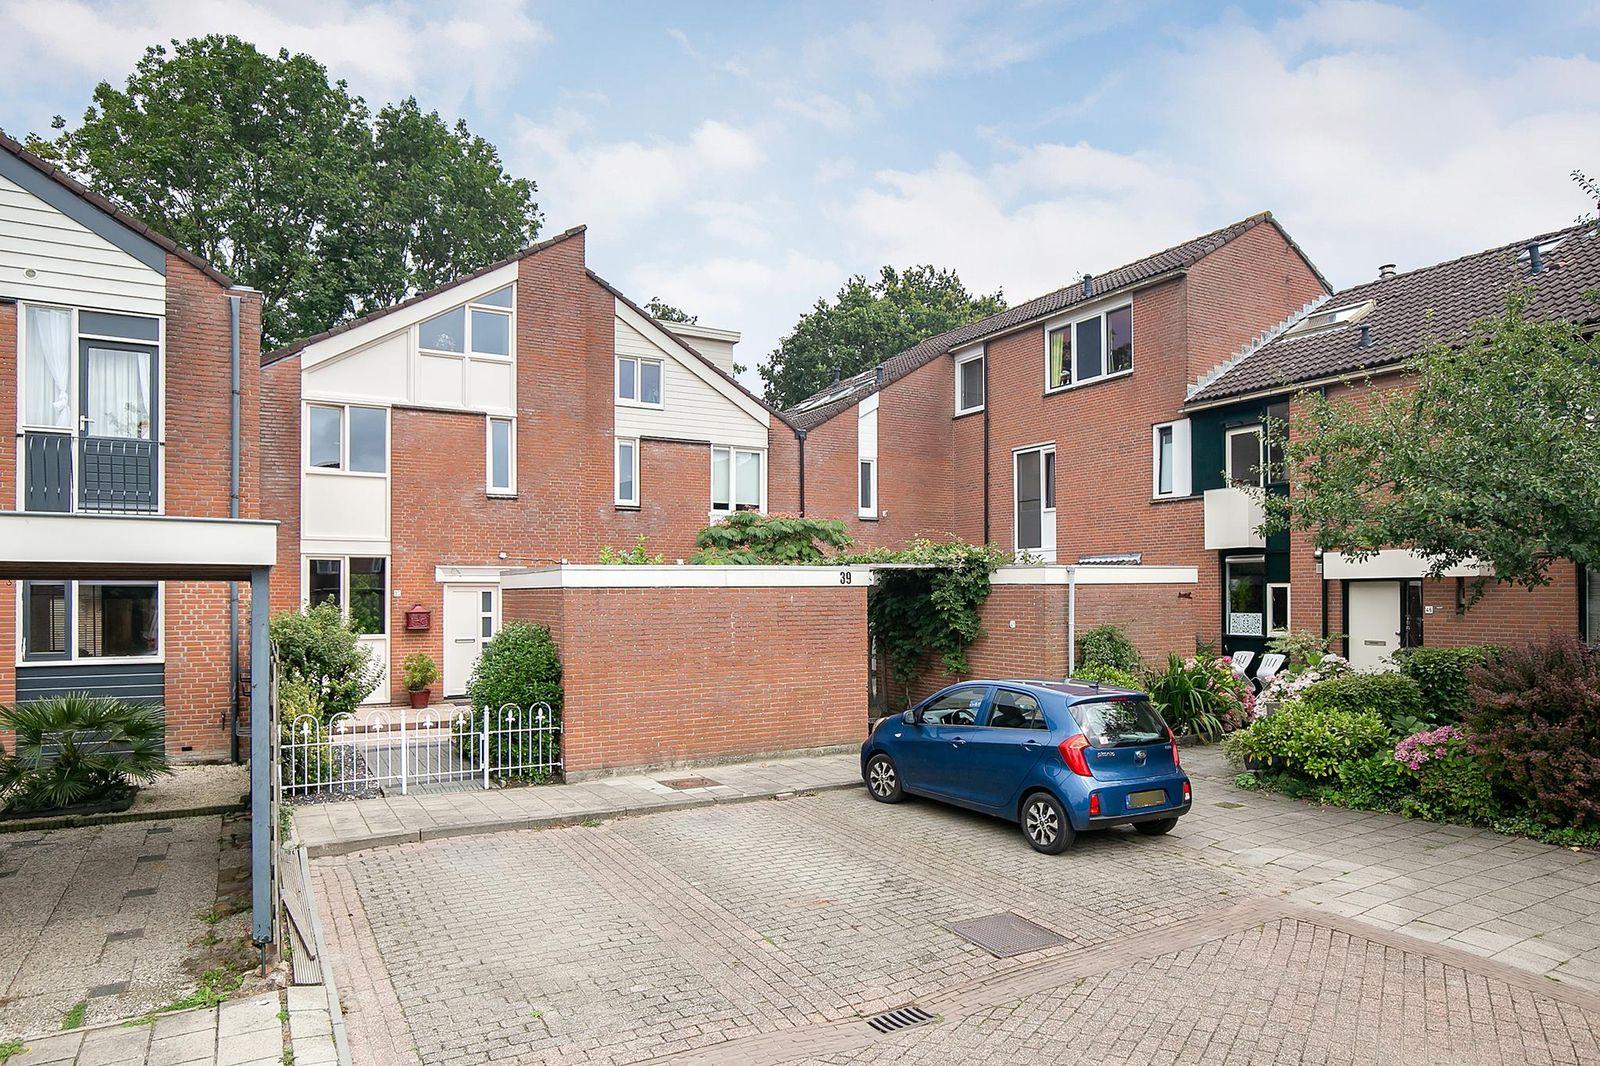 Duunmede 37, Middelburg